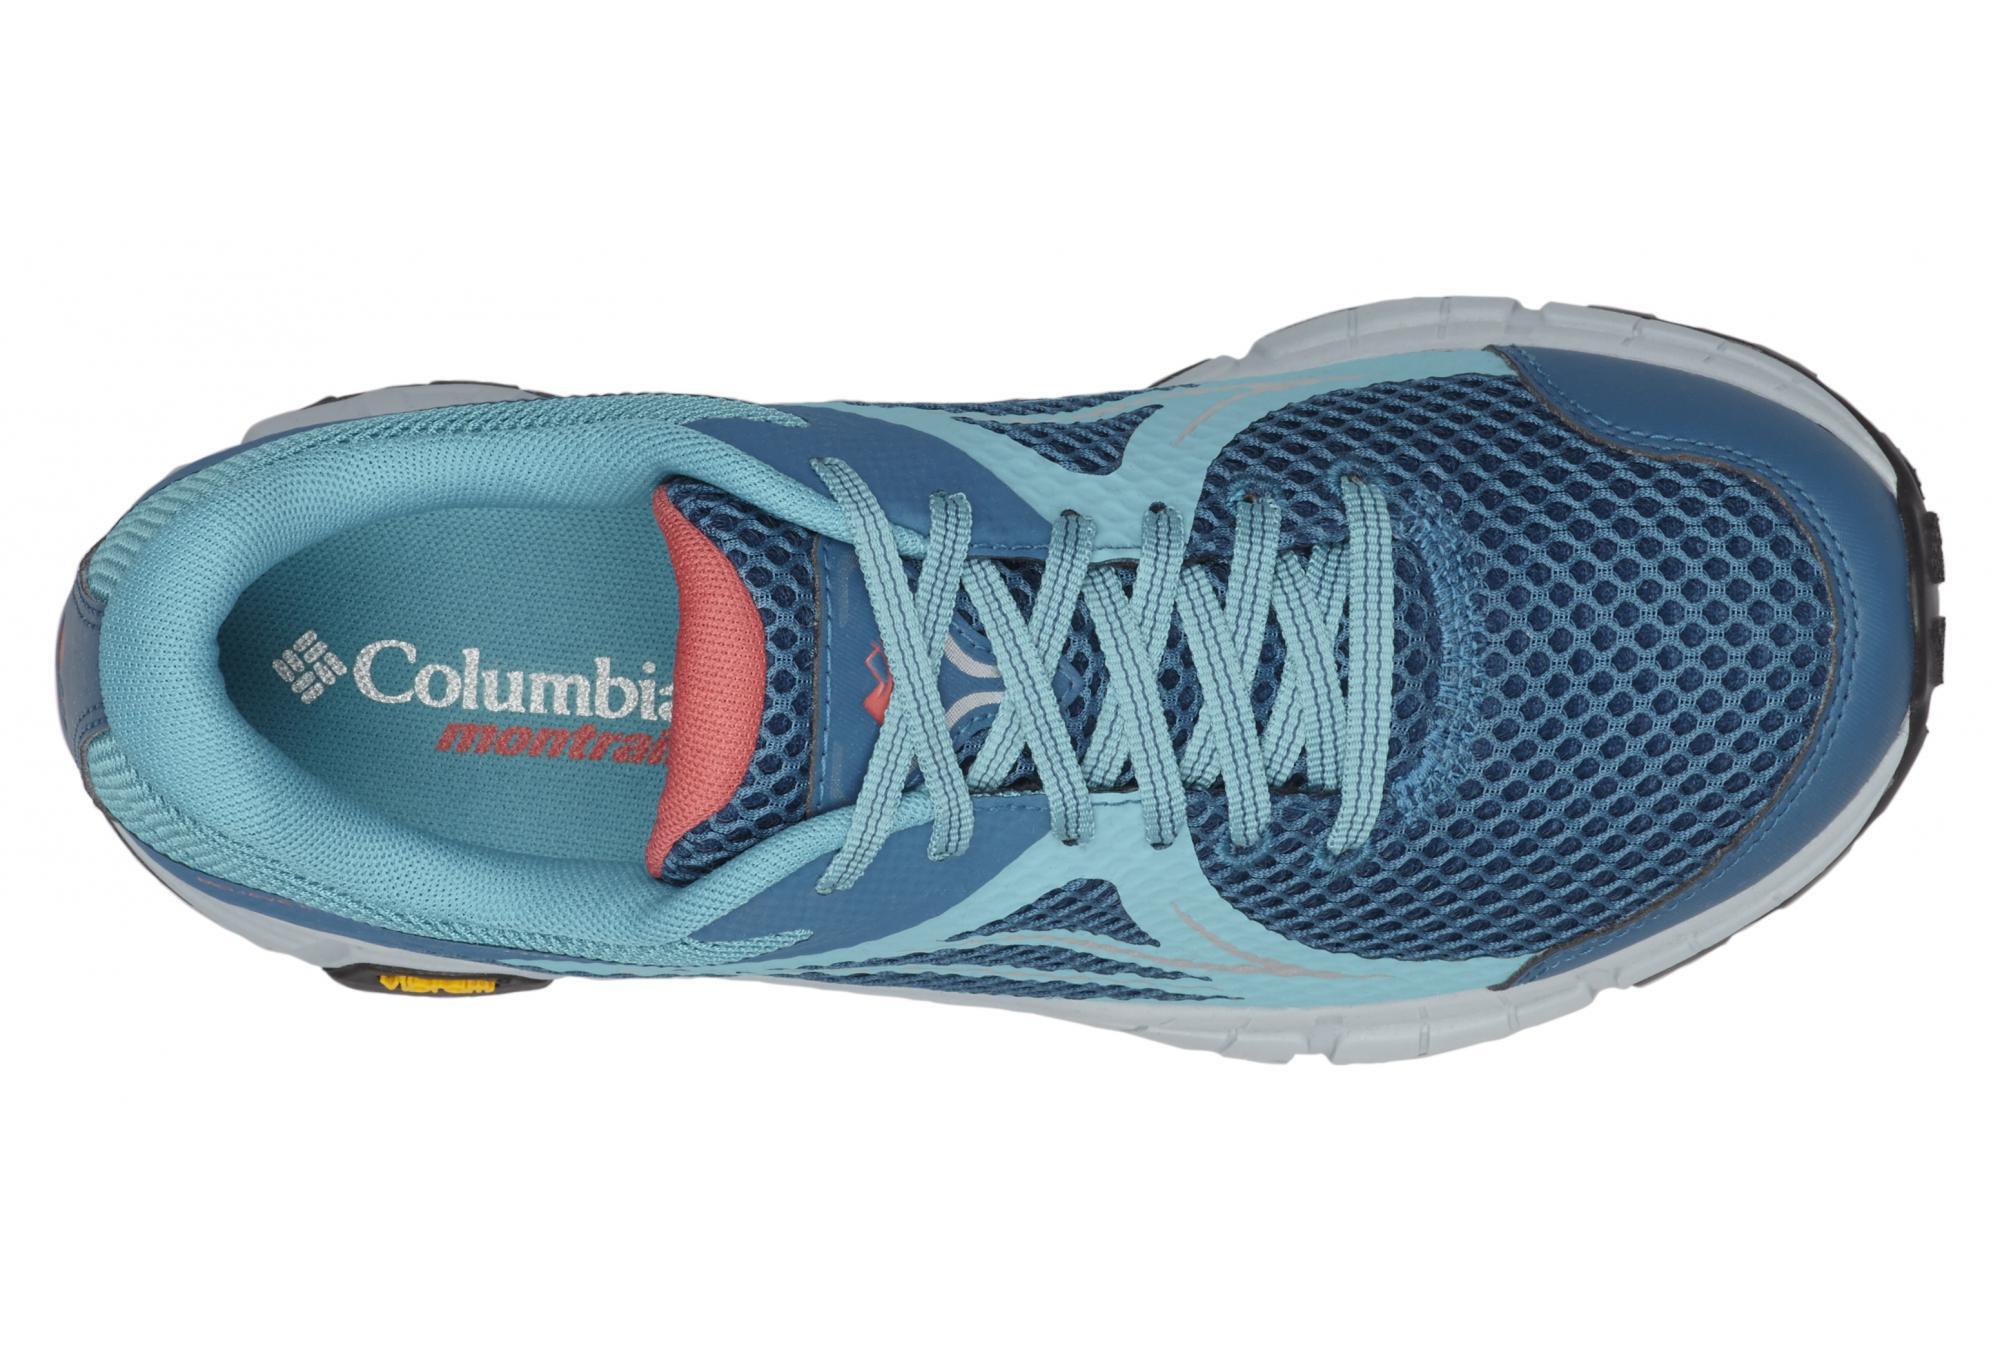 Chaussures Columbia Mojave Trail Femme De Bleu qPHrq6